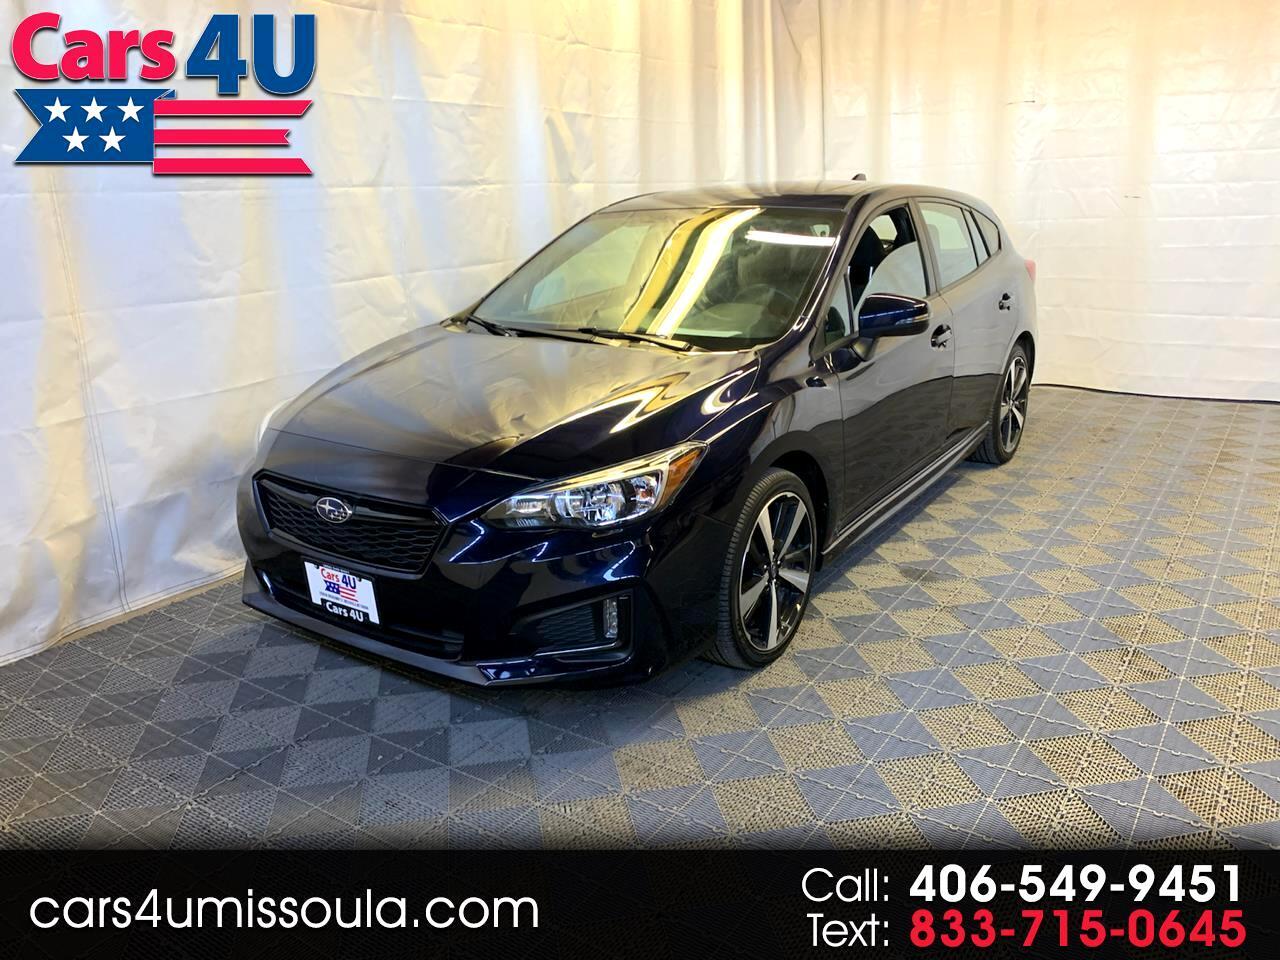 Subaru Impreza 2.0i Sport 5-door CVT 2019